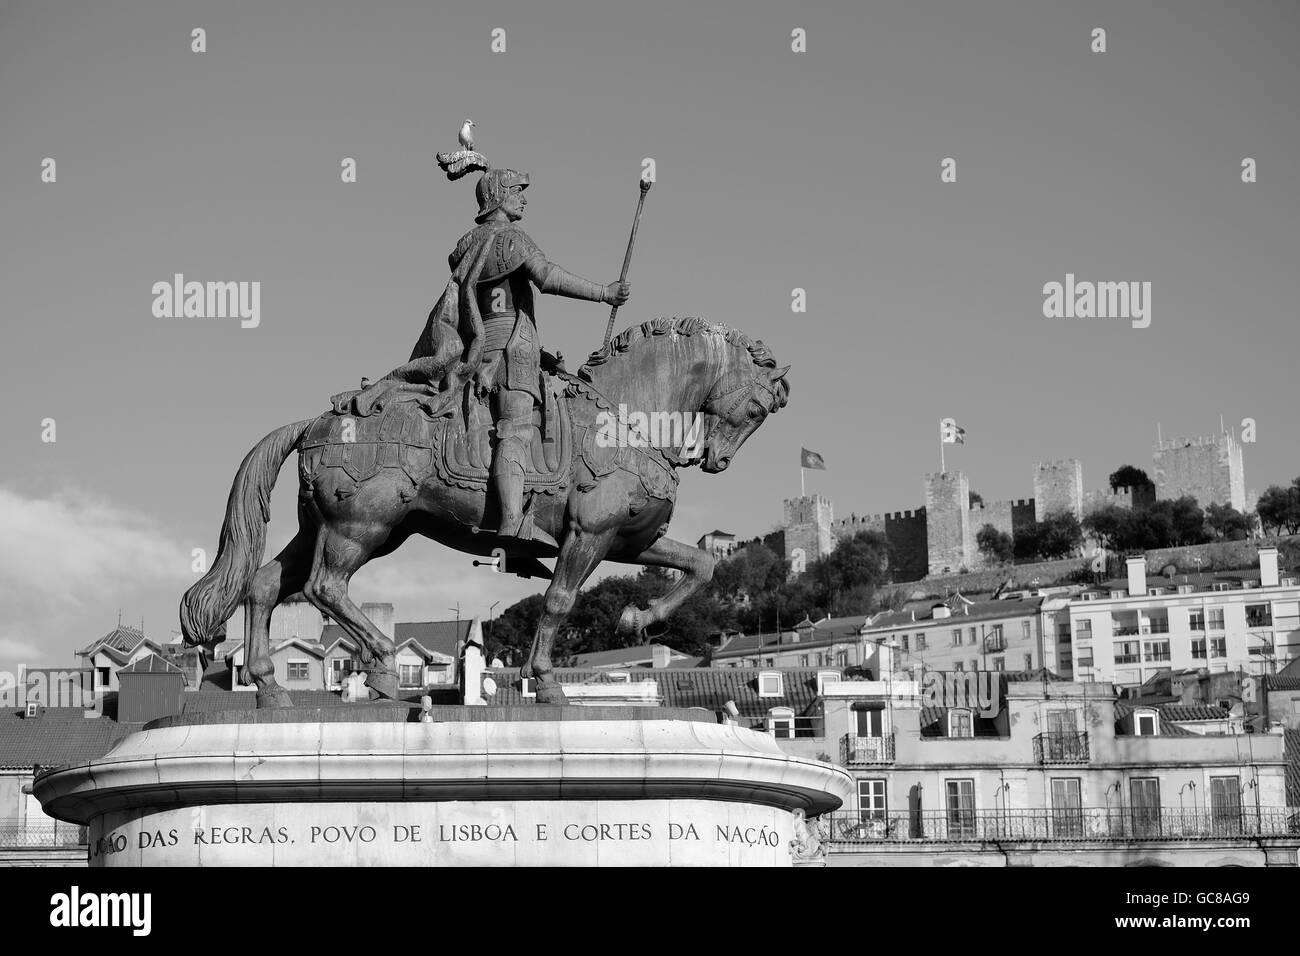 Estatua de Don Juan I Plaze de Figueira Lisbon Stock Photo